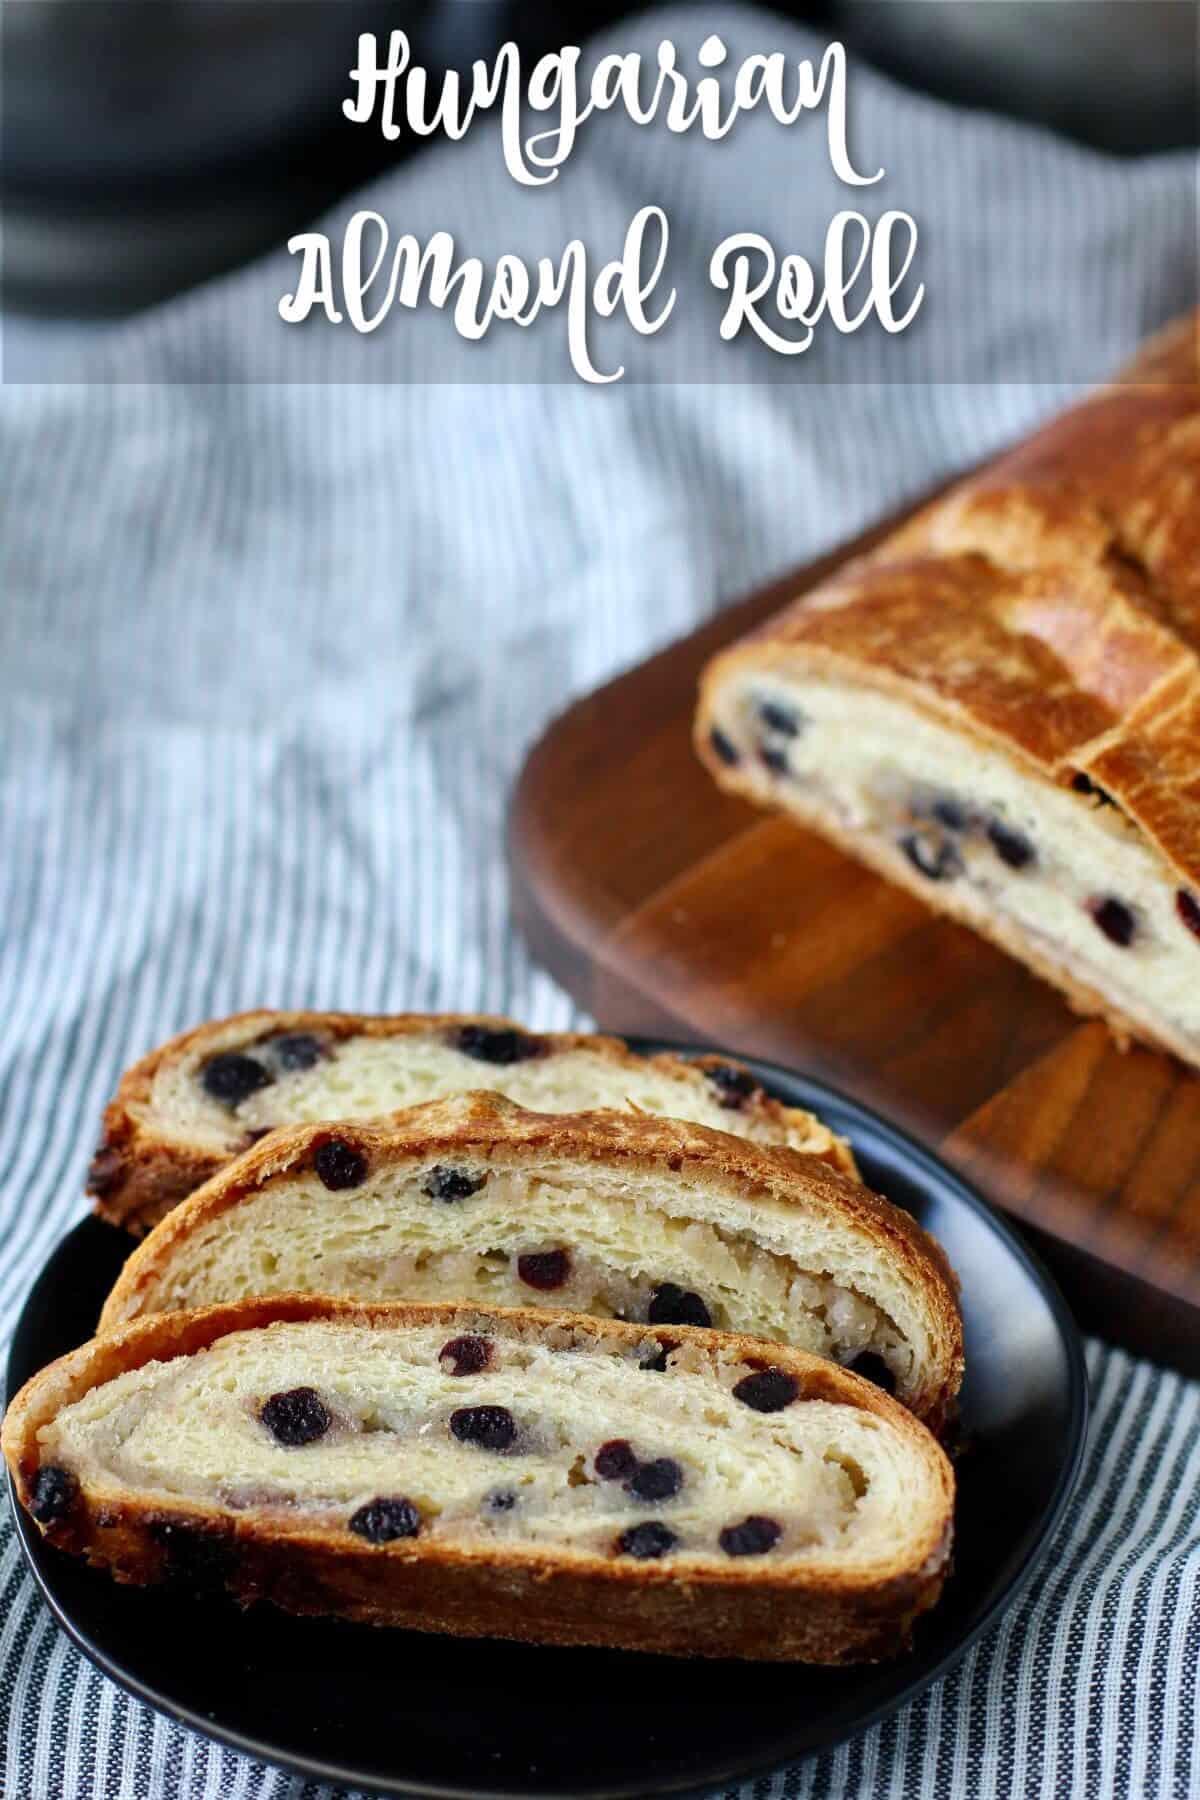 Hungarian Almond Roll Bread